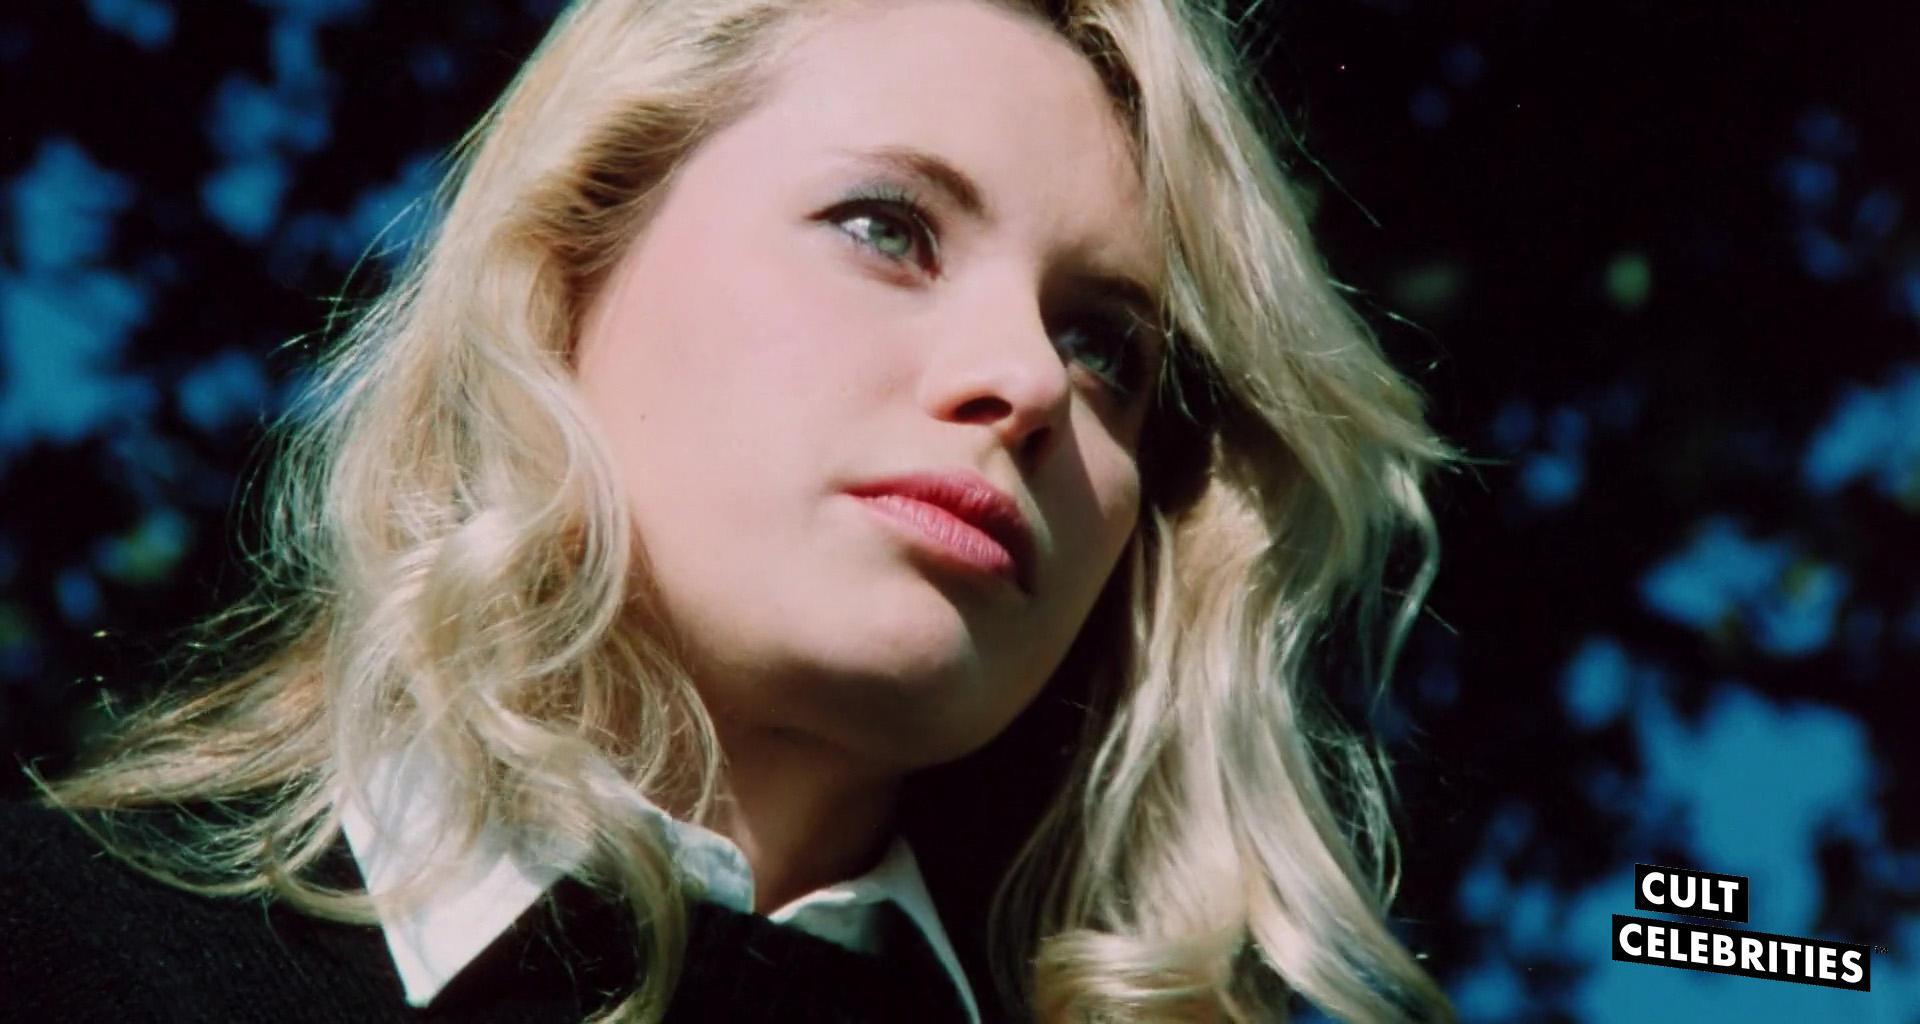 Elizabeth Kaitan in Silent Night Deadly Night 2 (1987)